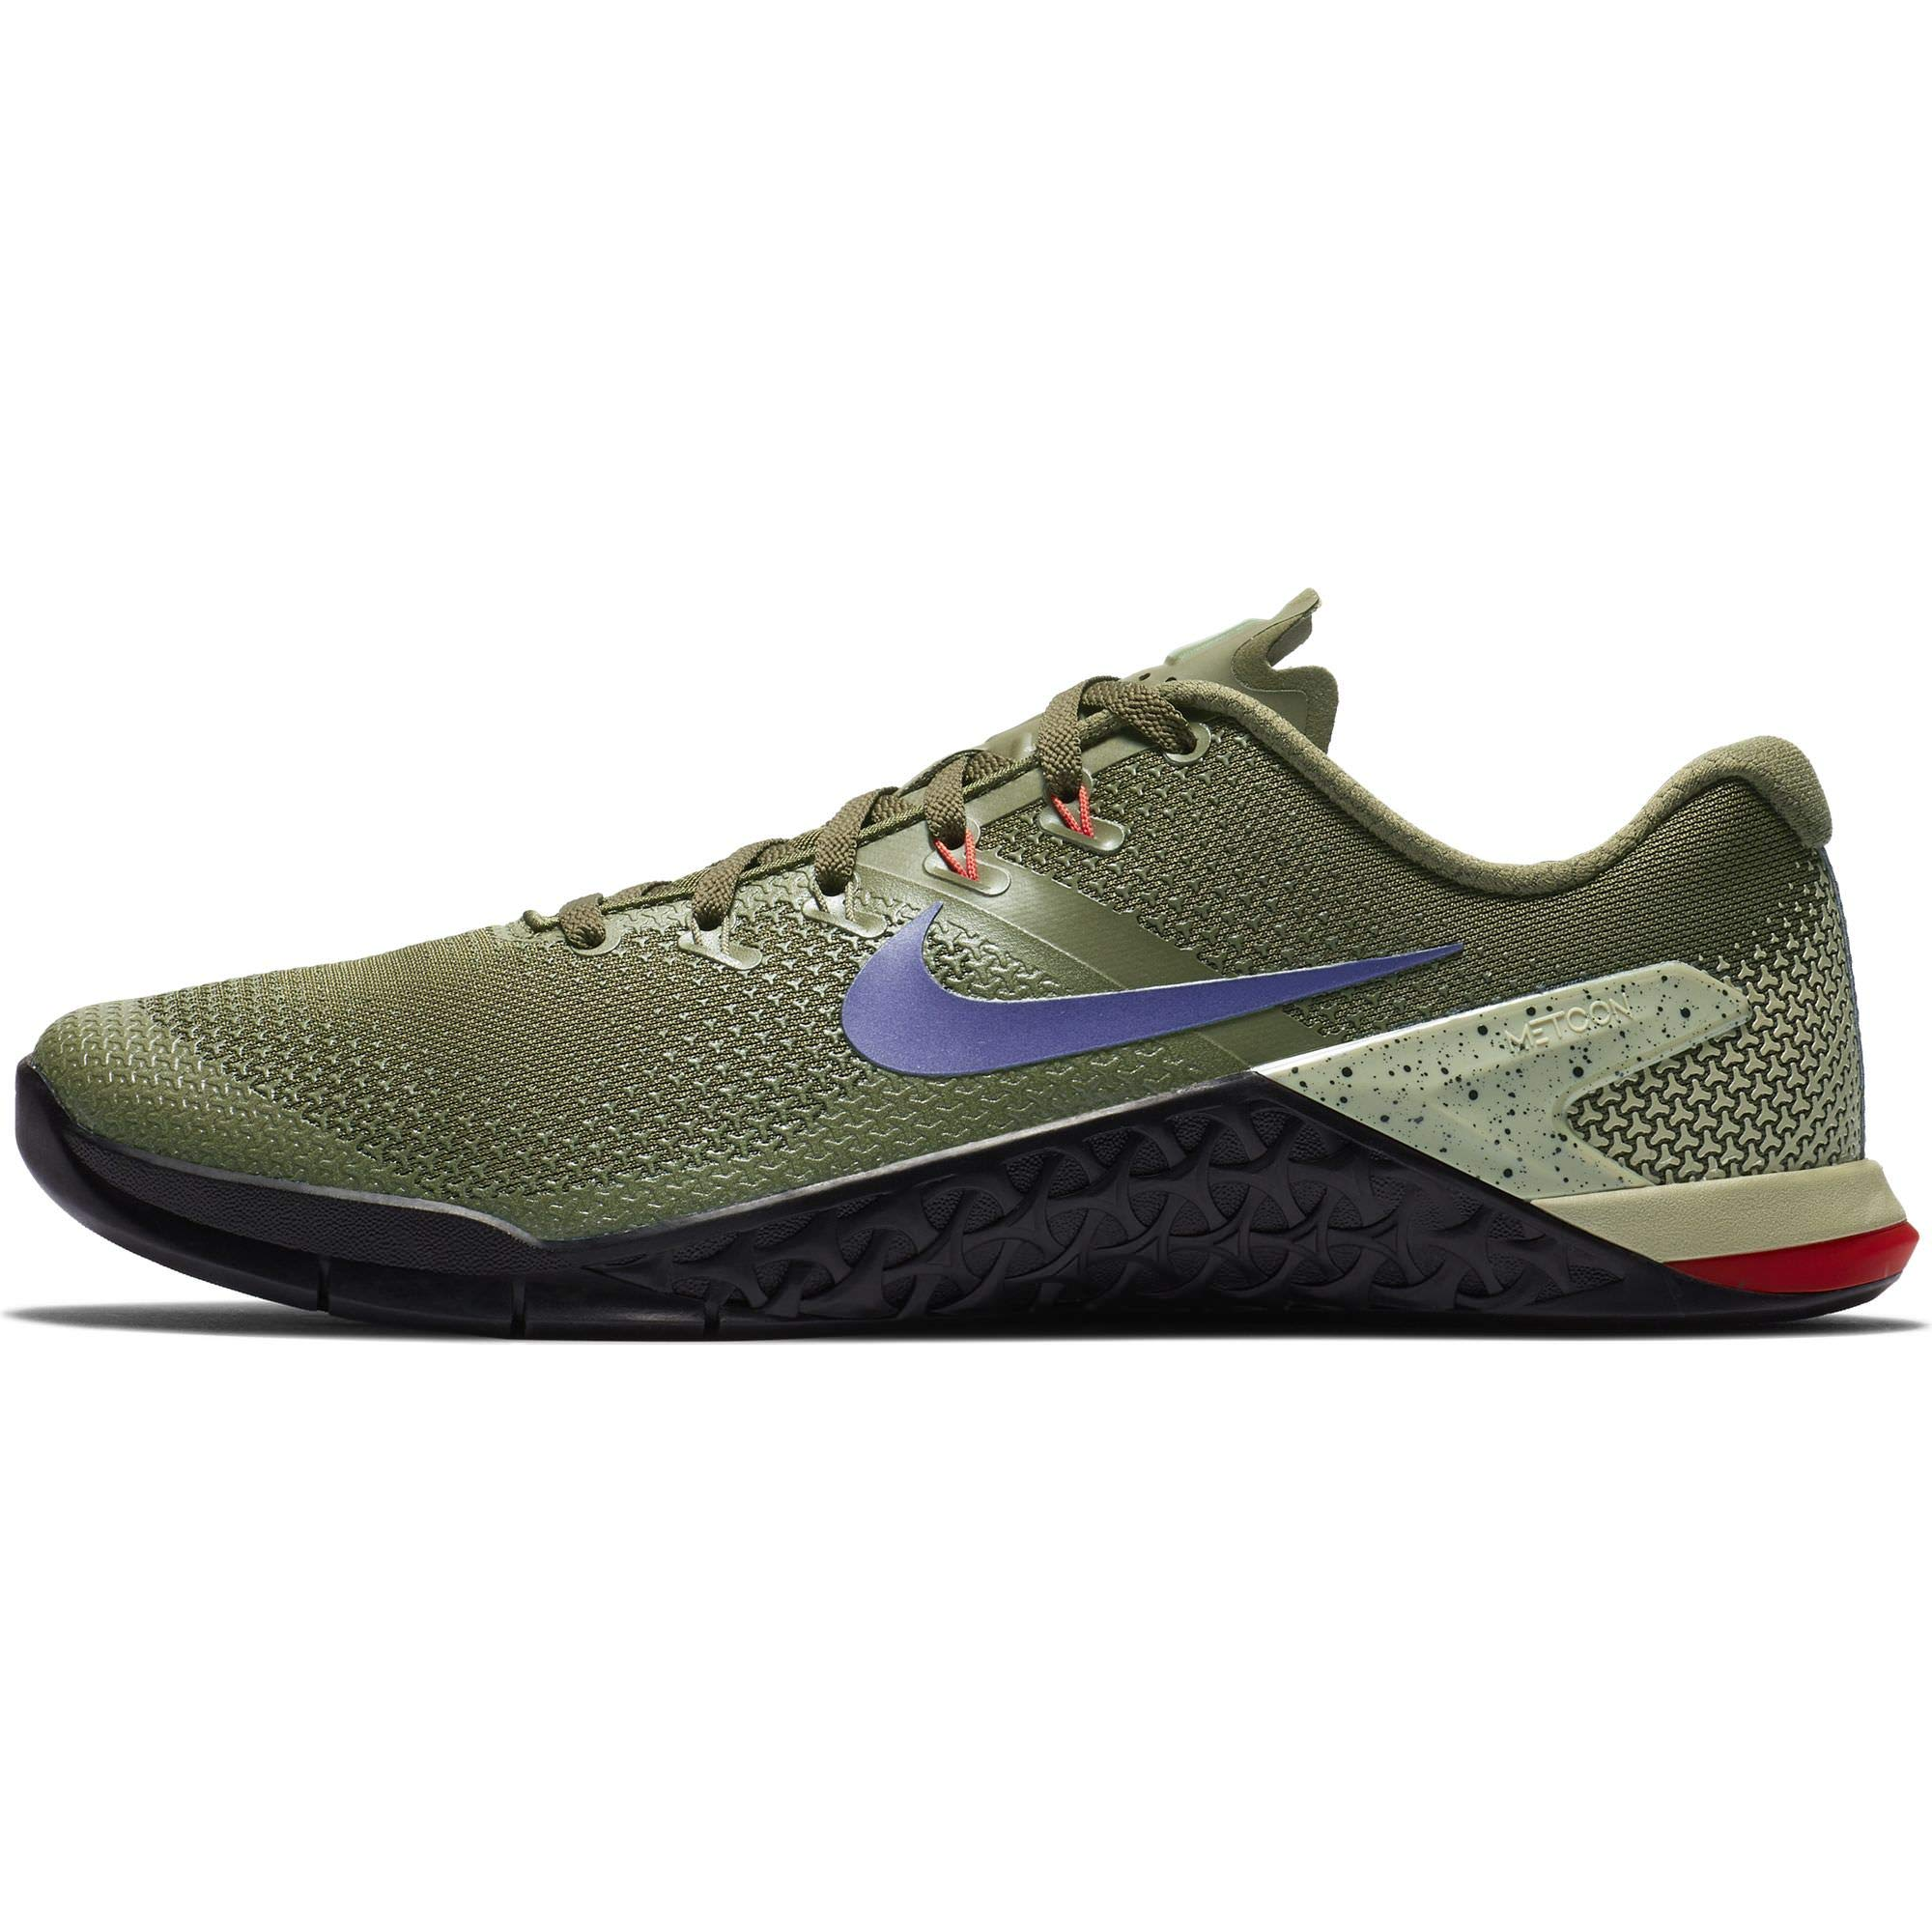 9bff448fcd0 Galleon - Nike Men s Metcon 4 Training Shoe Olive Canvas Indigo Burst Black  Size 8.5 D US